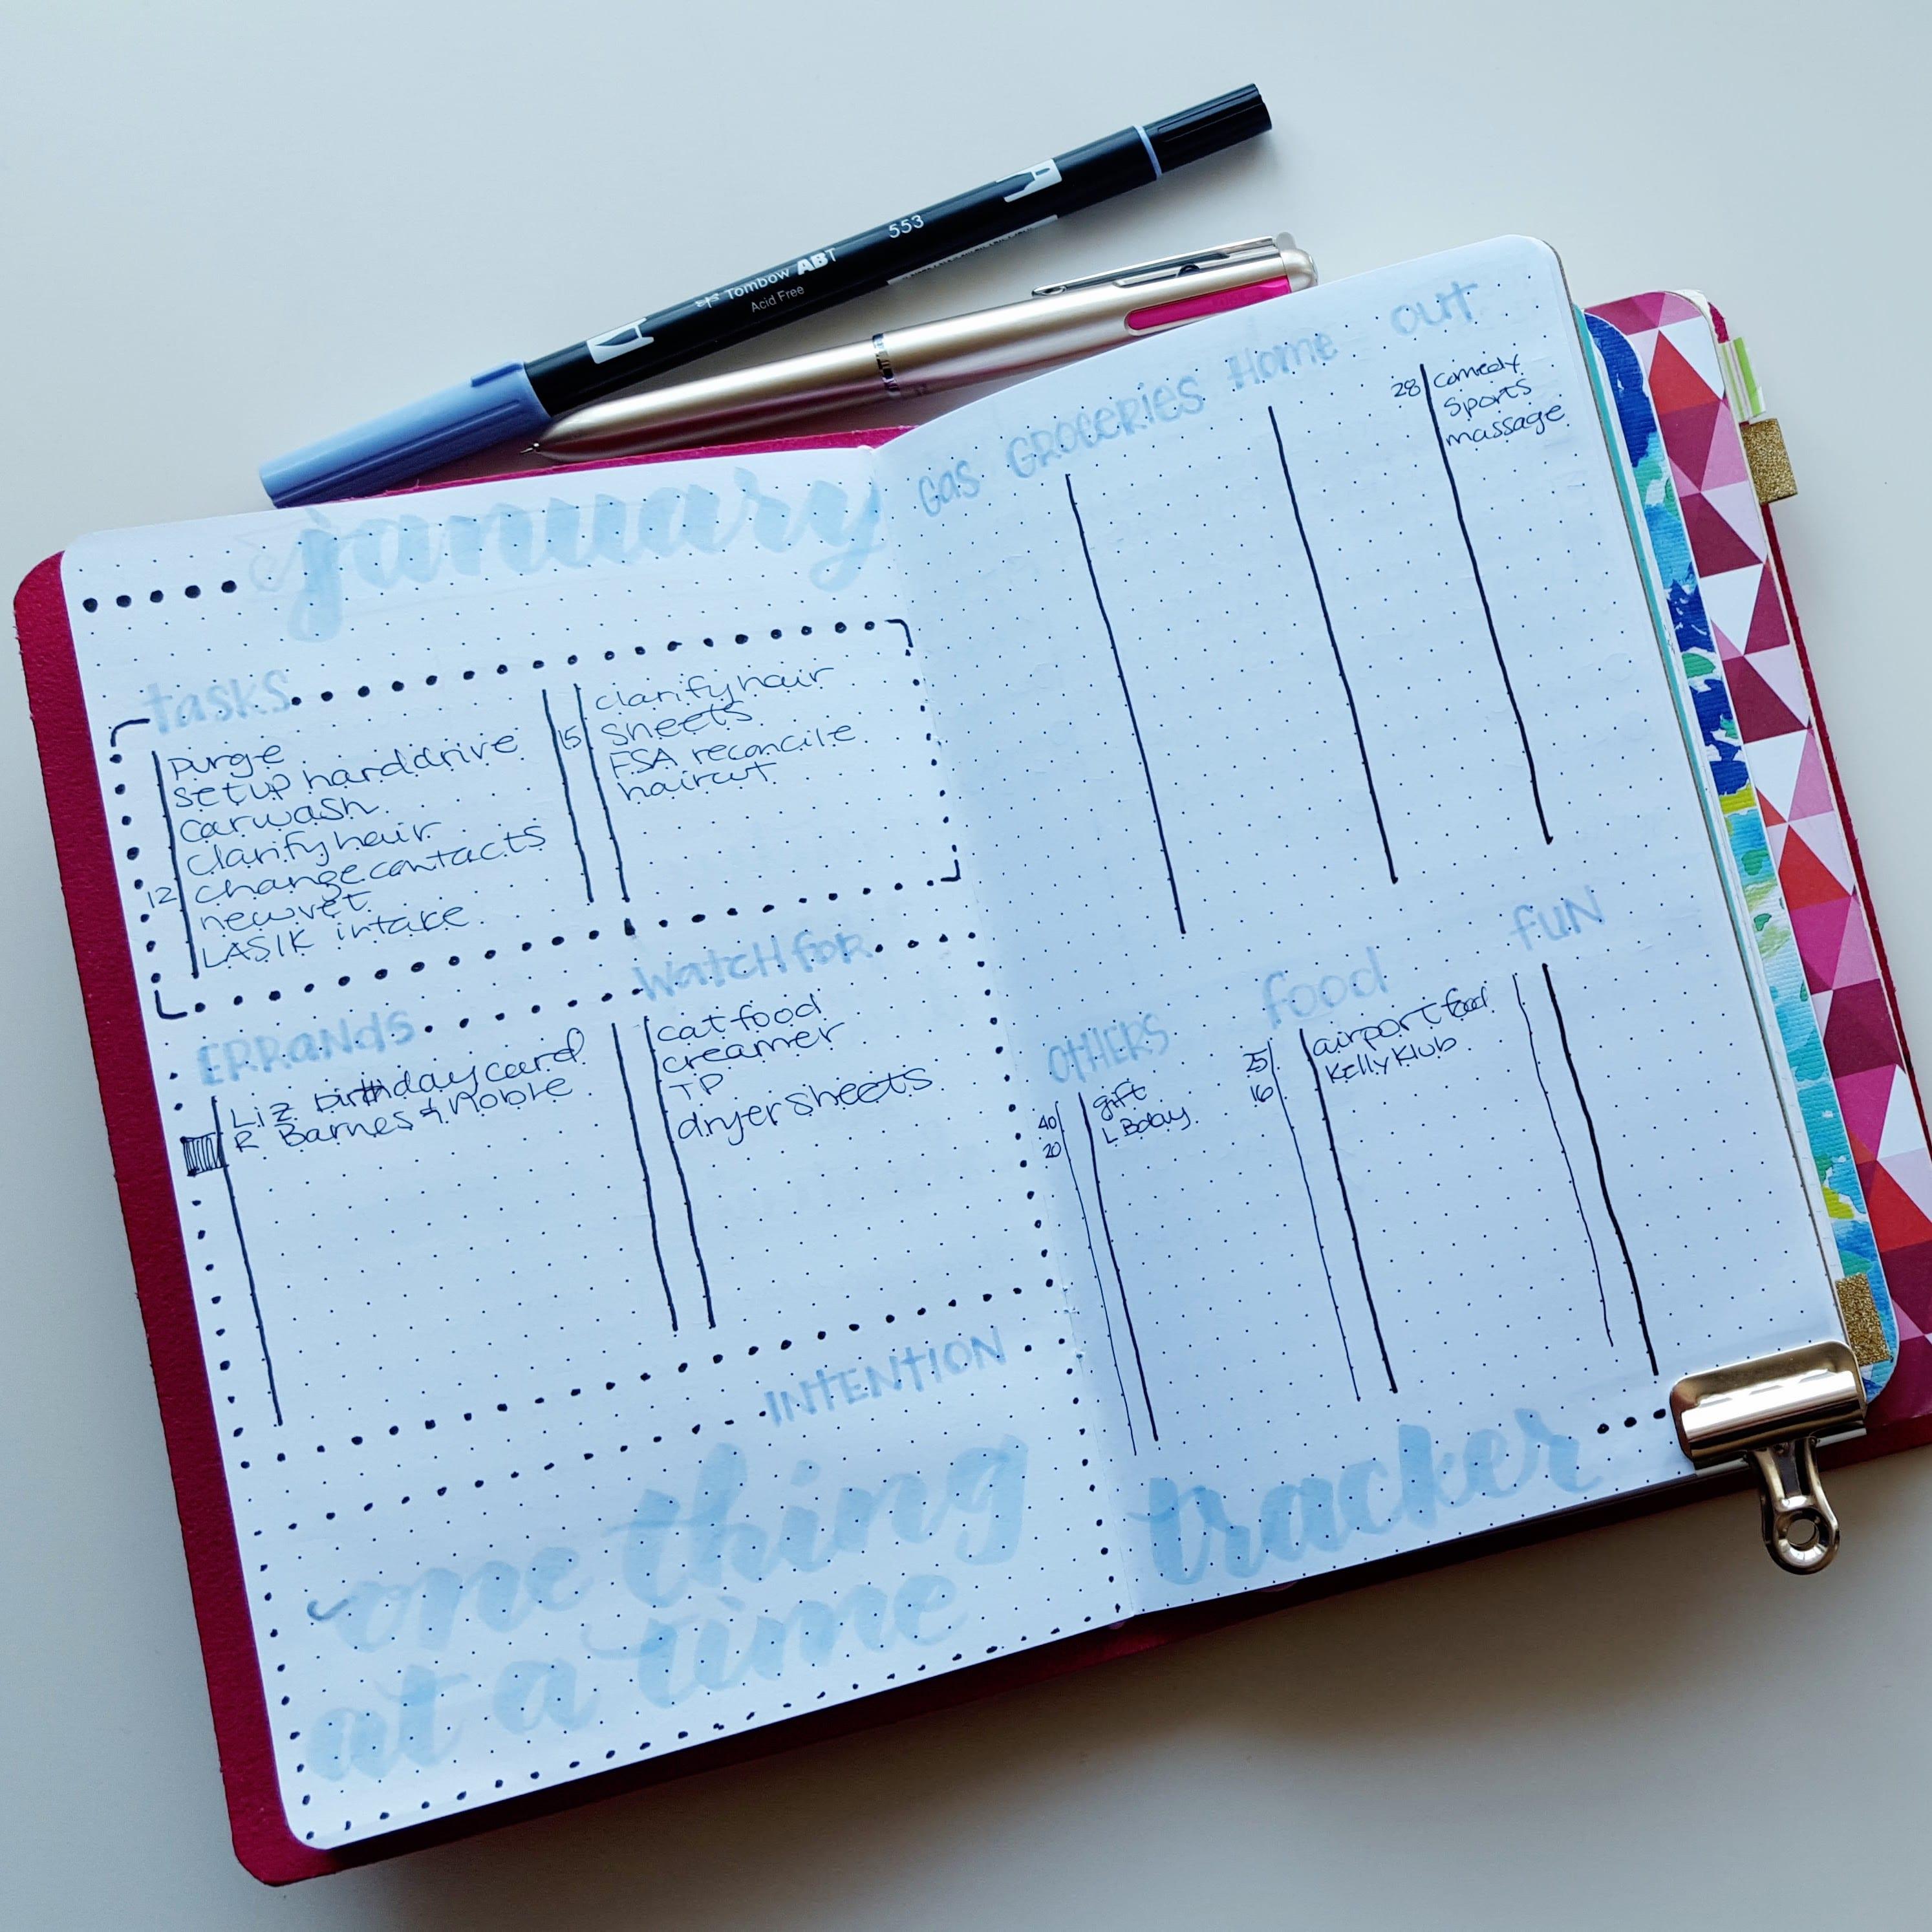 My January tracker in my bullet journal that tracks tasks, errands, and expenses for the month // www.prettyprintsandpaper.com